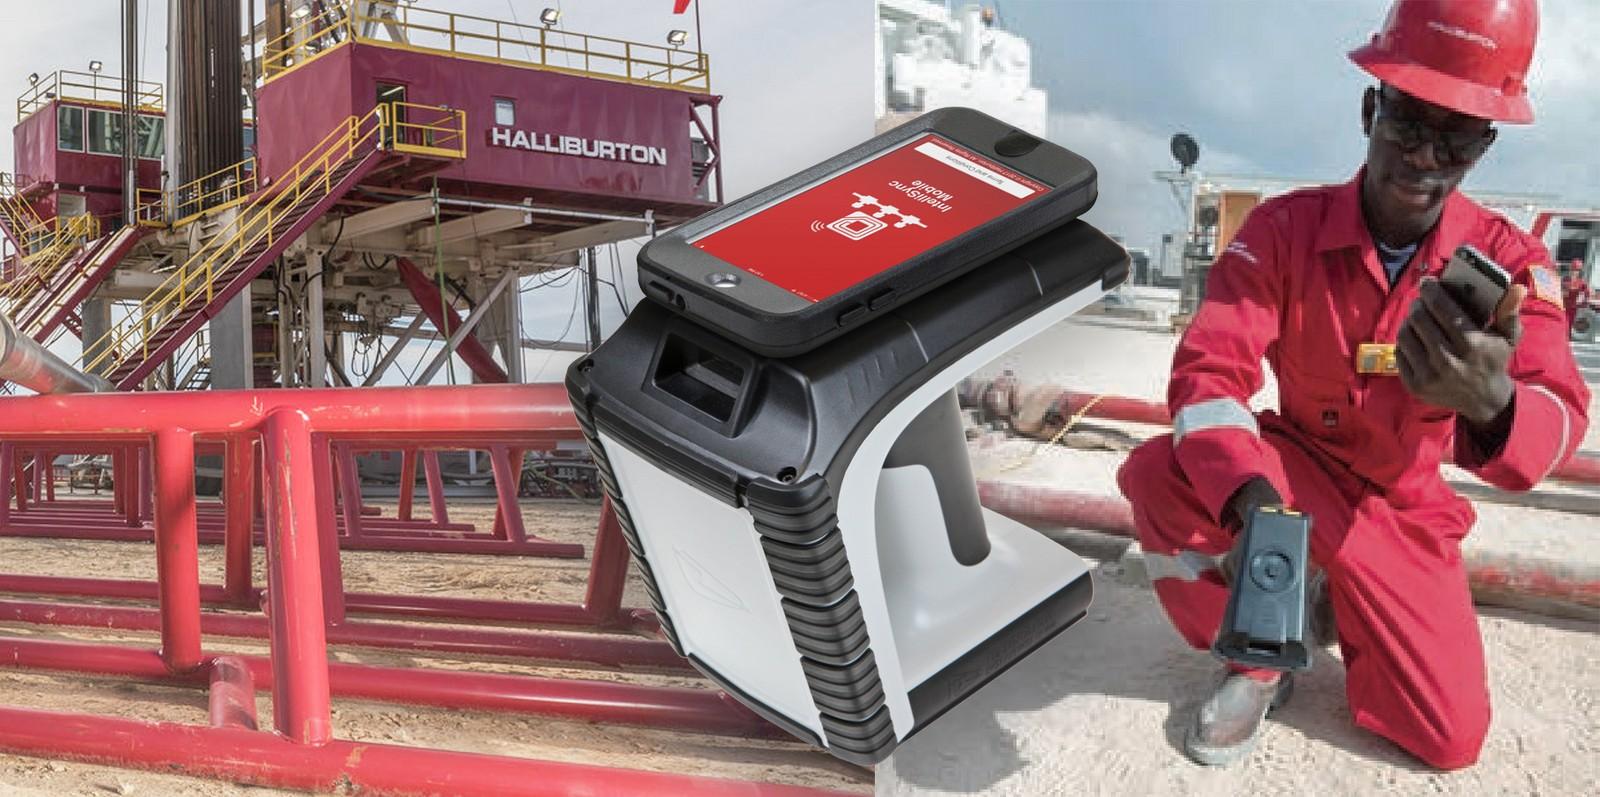 Halliburton's IntelliSync™ System Uses UHF RFID Technology